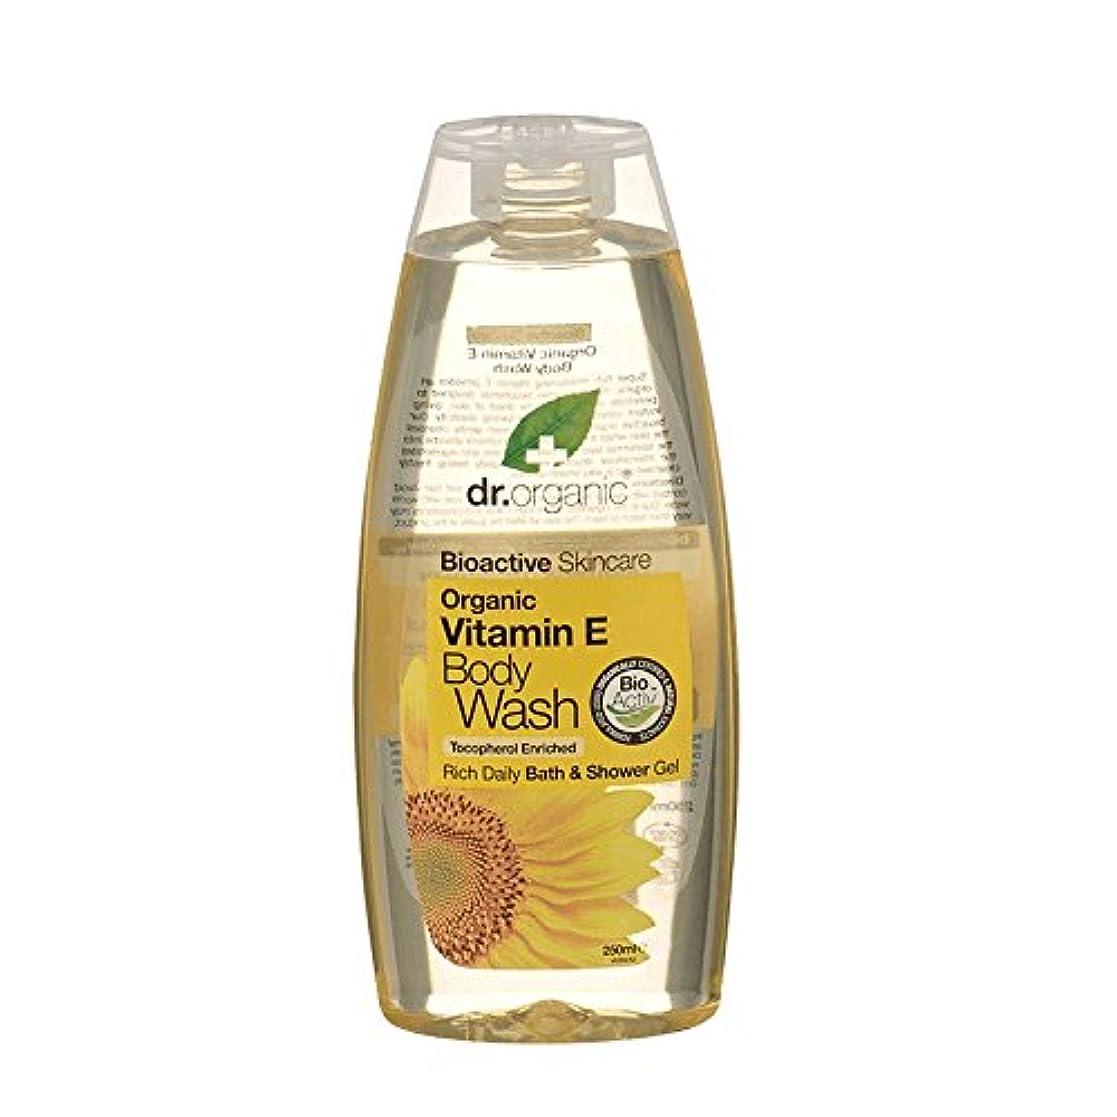 Dr有機ビタミンEボディウォッシュ - Dr Organic Vitamin E Body Wash (Dr Organic) [並行輸入品]